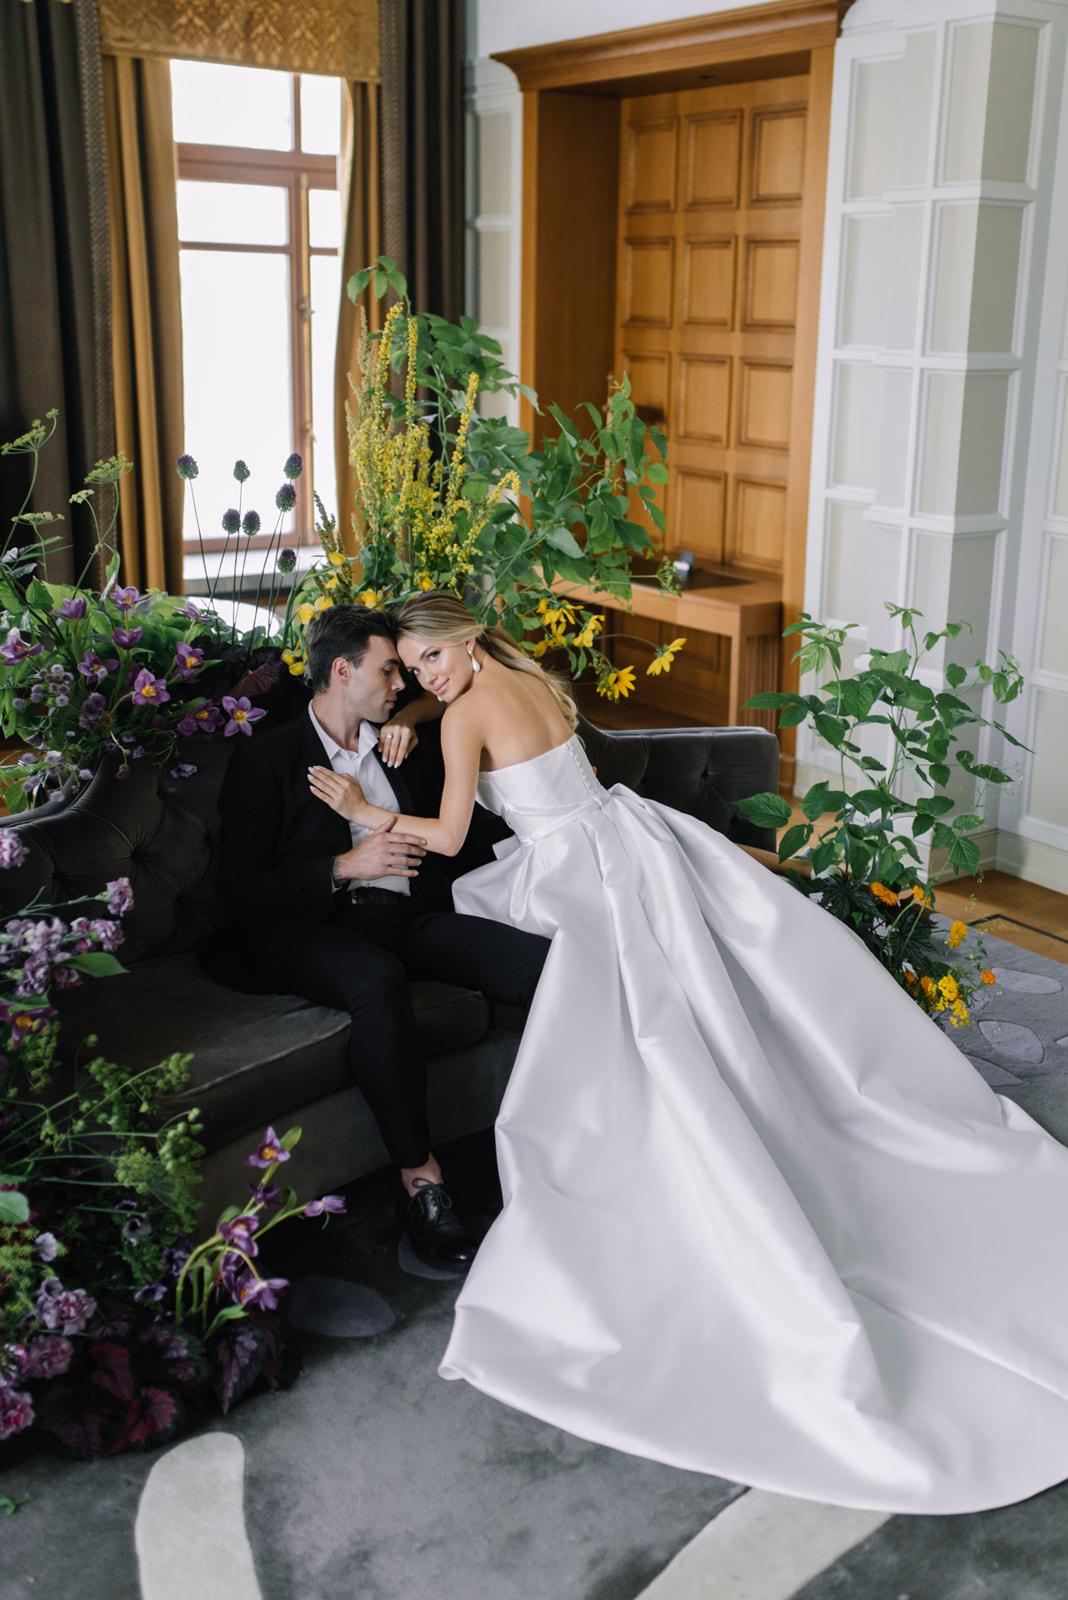 Mr&Mrs Perfect